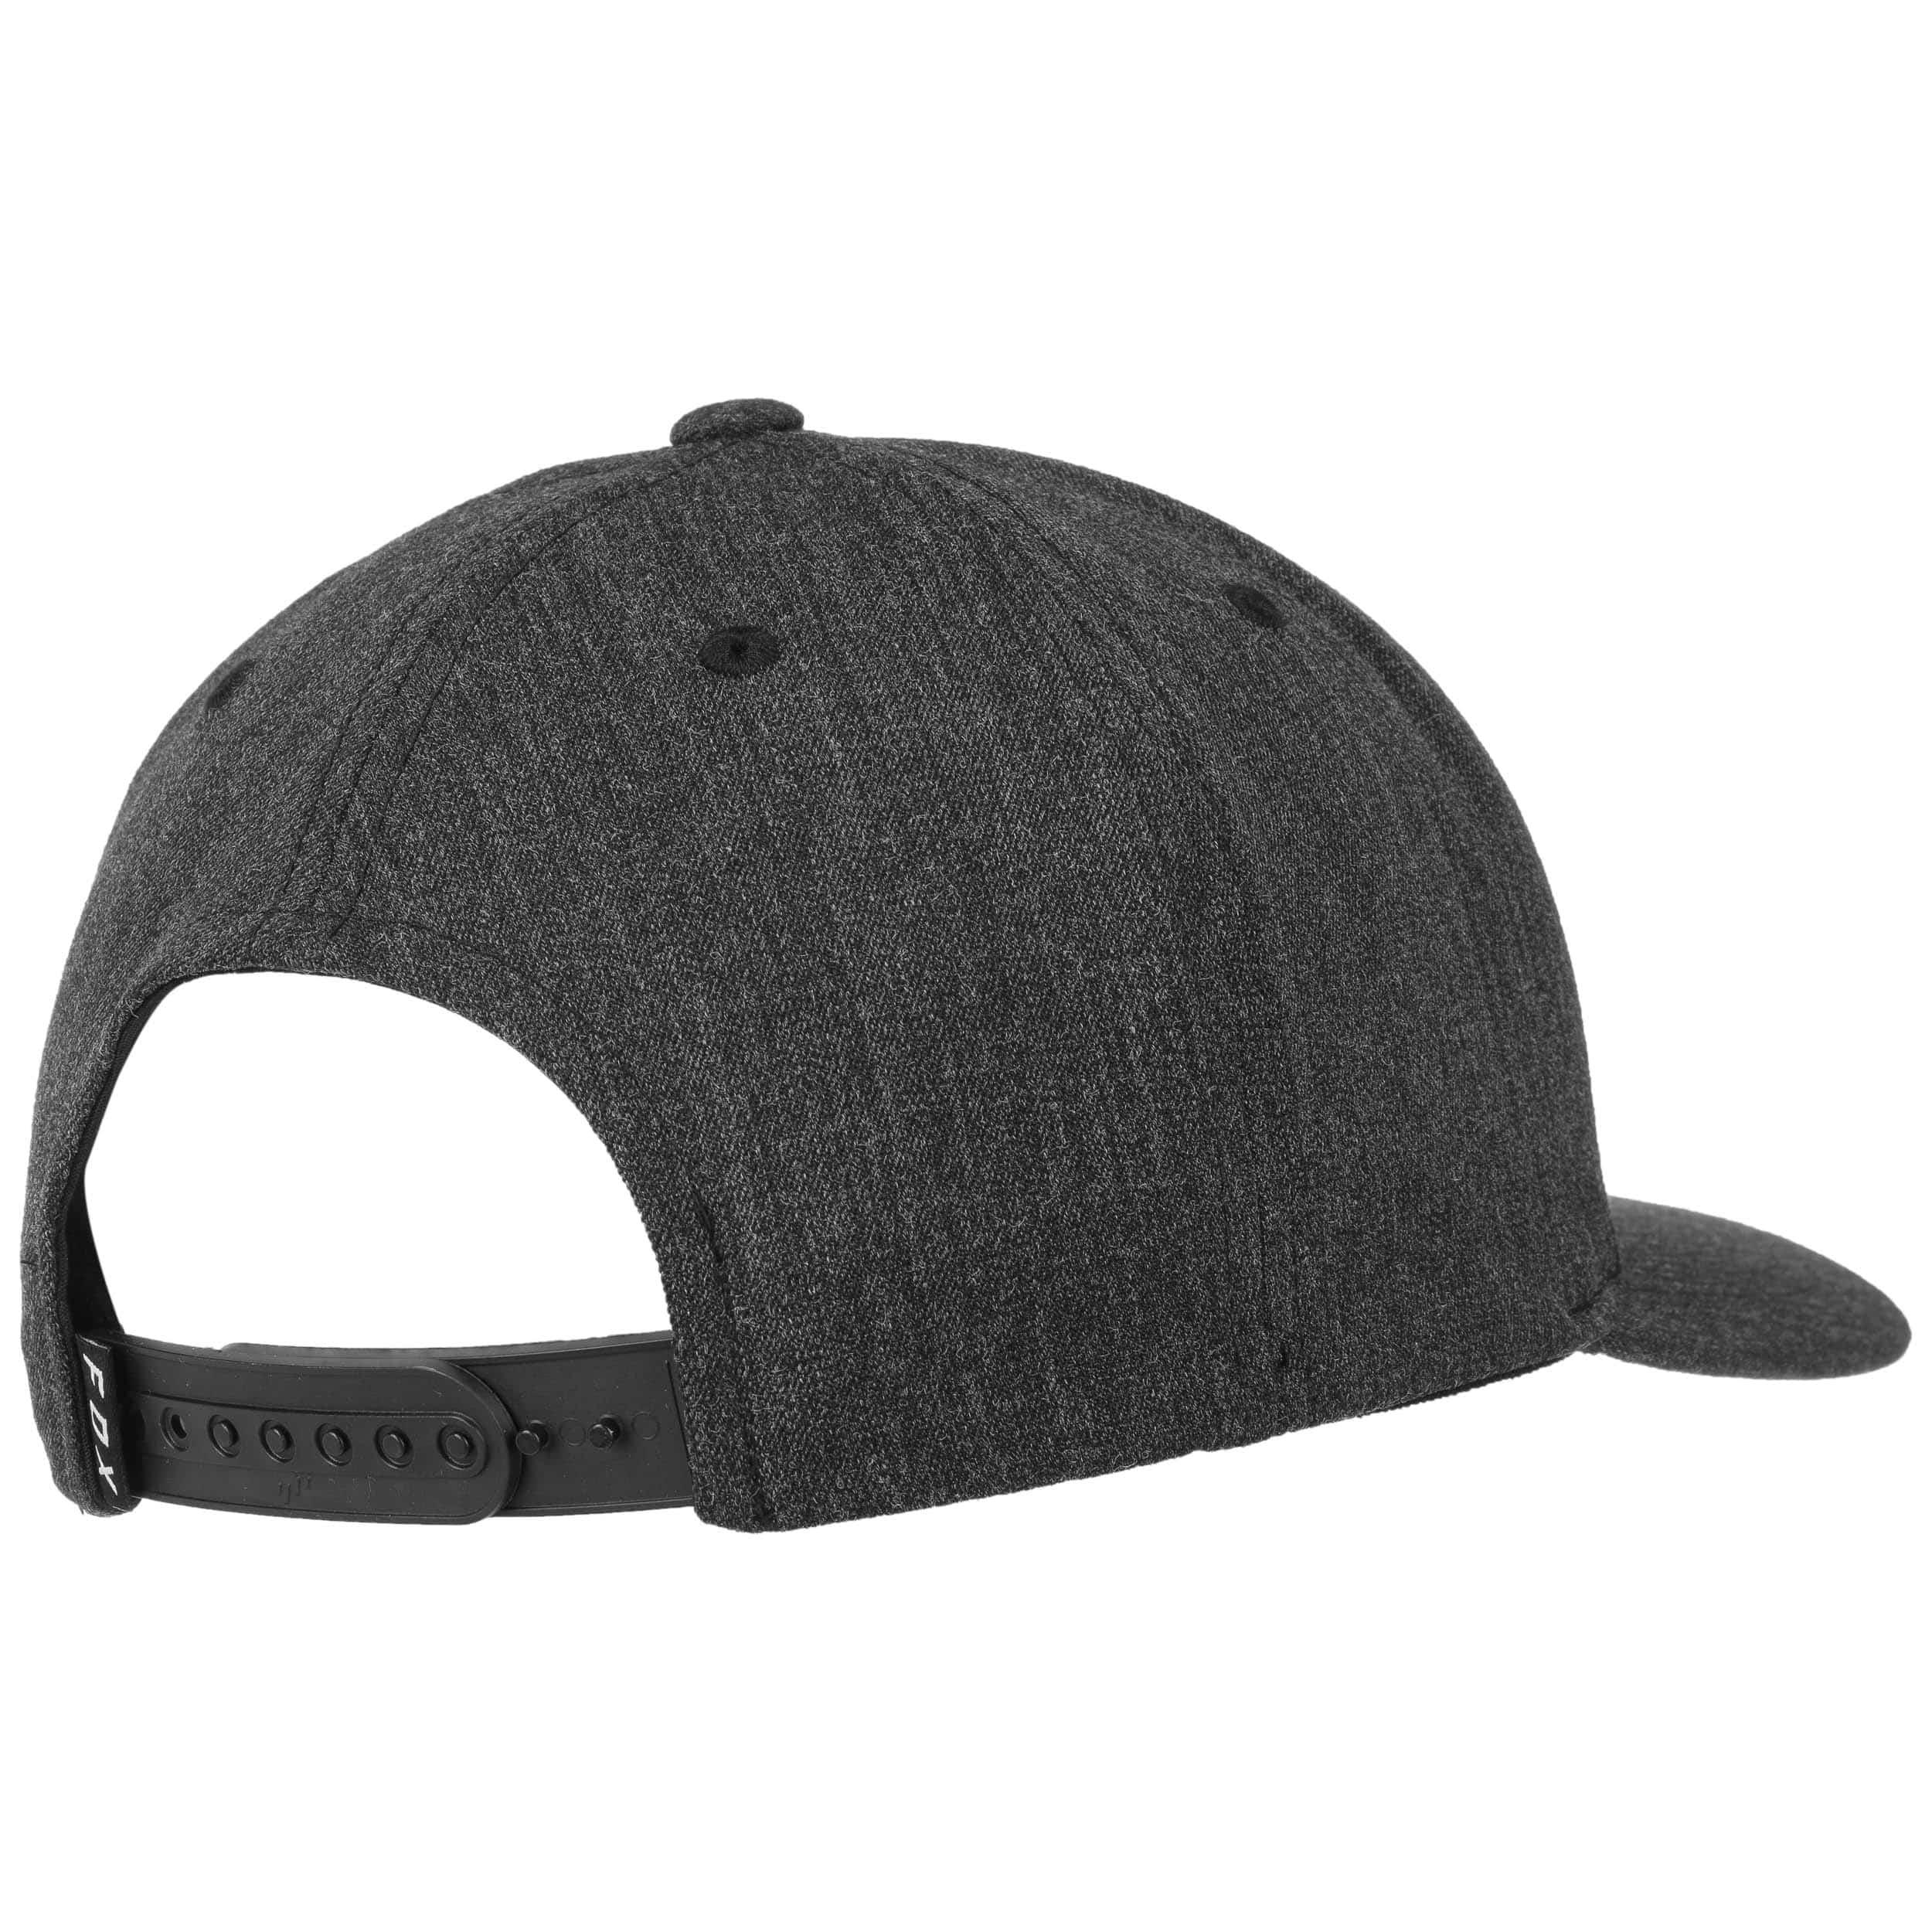 online retailer 9ff7a 79f9d ... canada fox racing ktm rock fader snapback hat available at  motocrossgiant 9f223 8d6b7